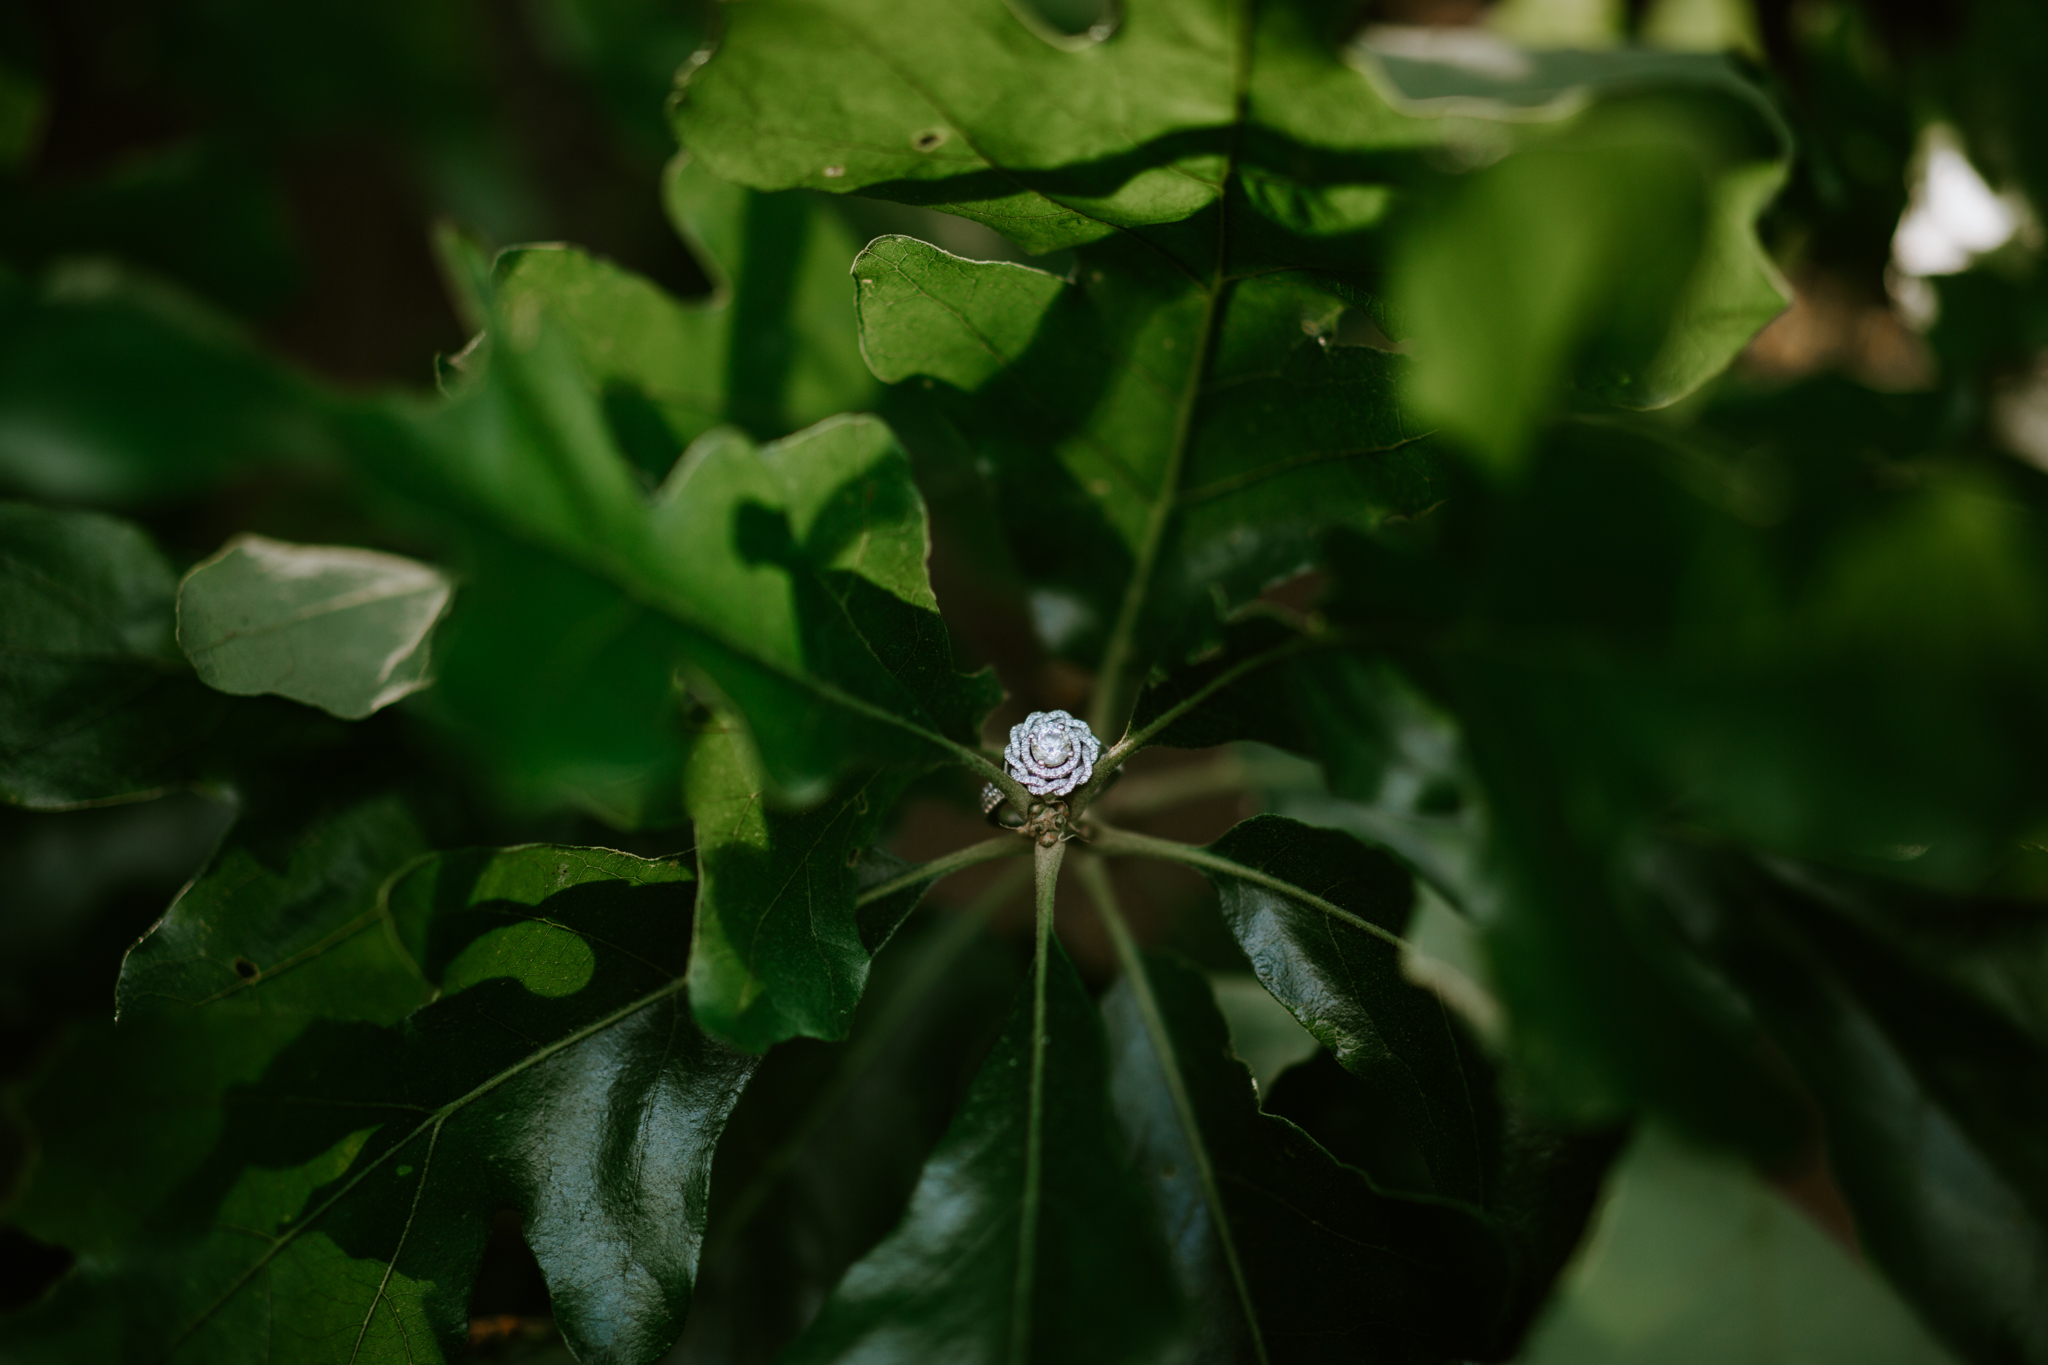 Courtney-Jordan-Chattanooga-Nashville-Tennessee-Wedding-Elopement-Photographer-72.jpg